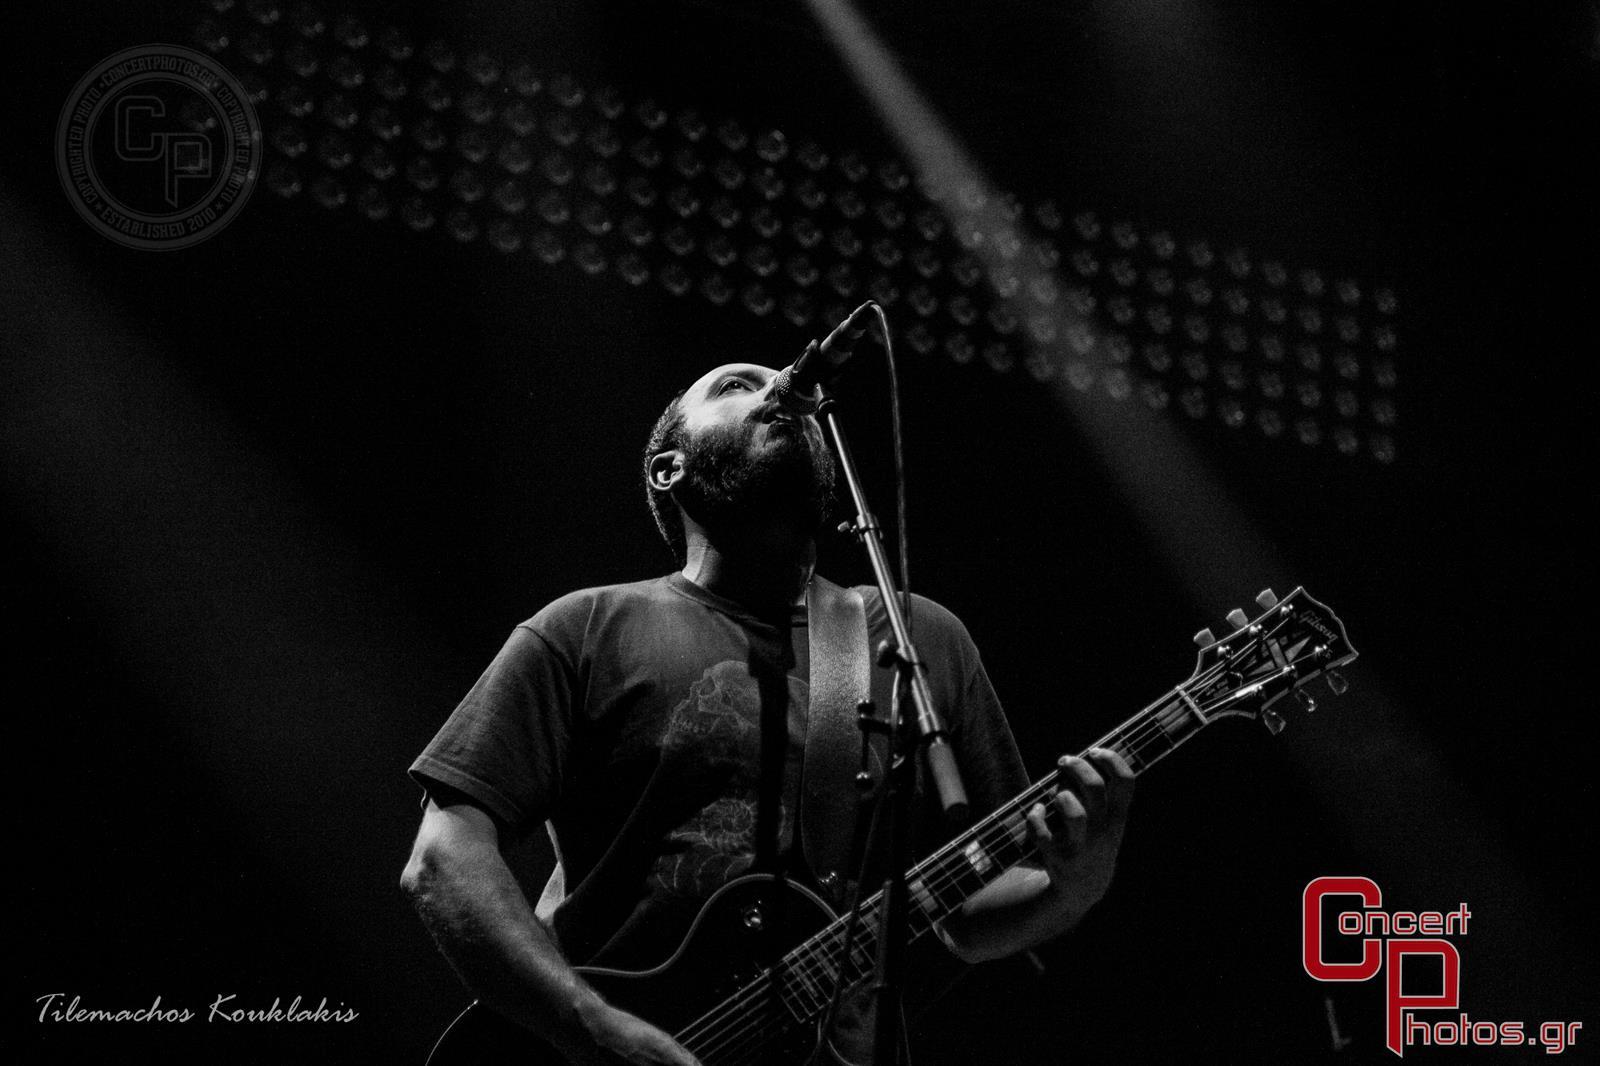 Neurosis-Neurosis photographer:  - concertphotos_20140707_23_56_37-5